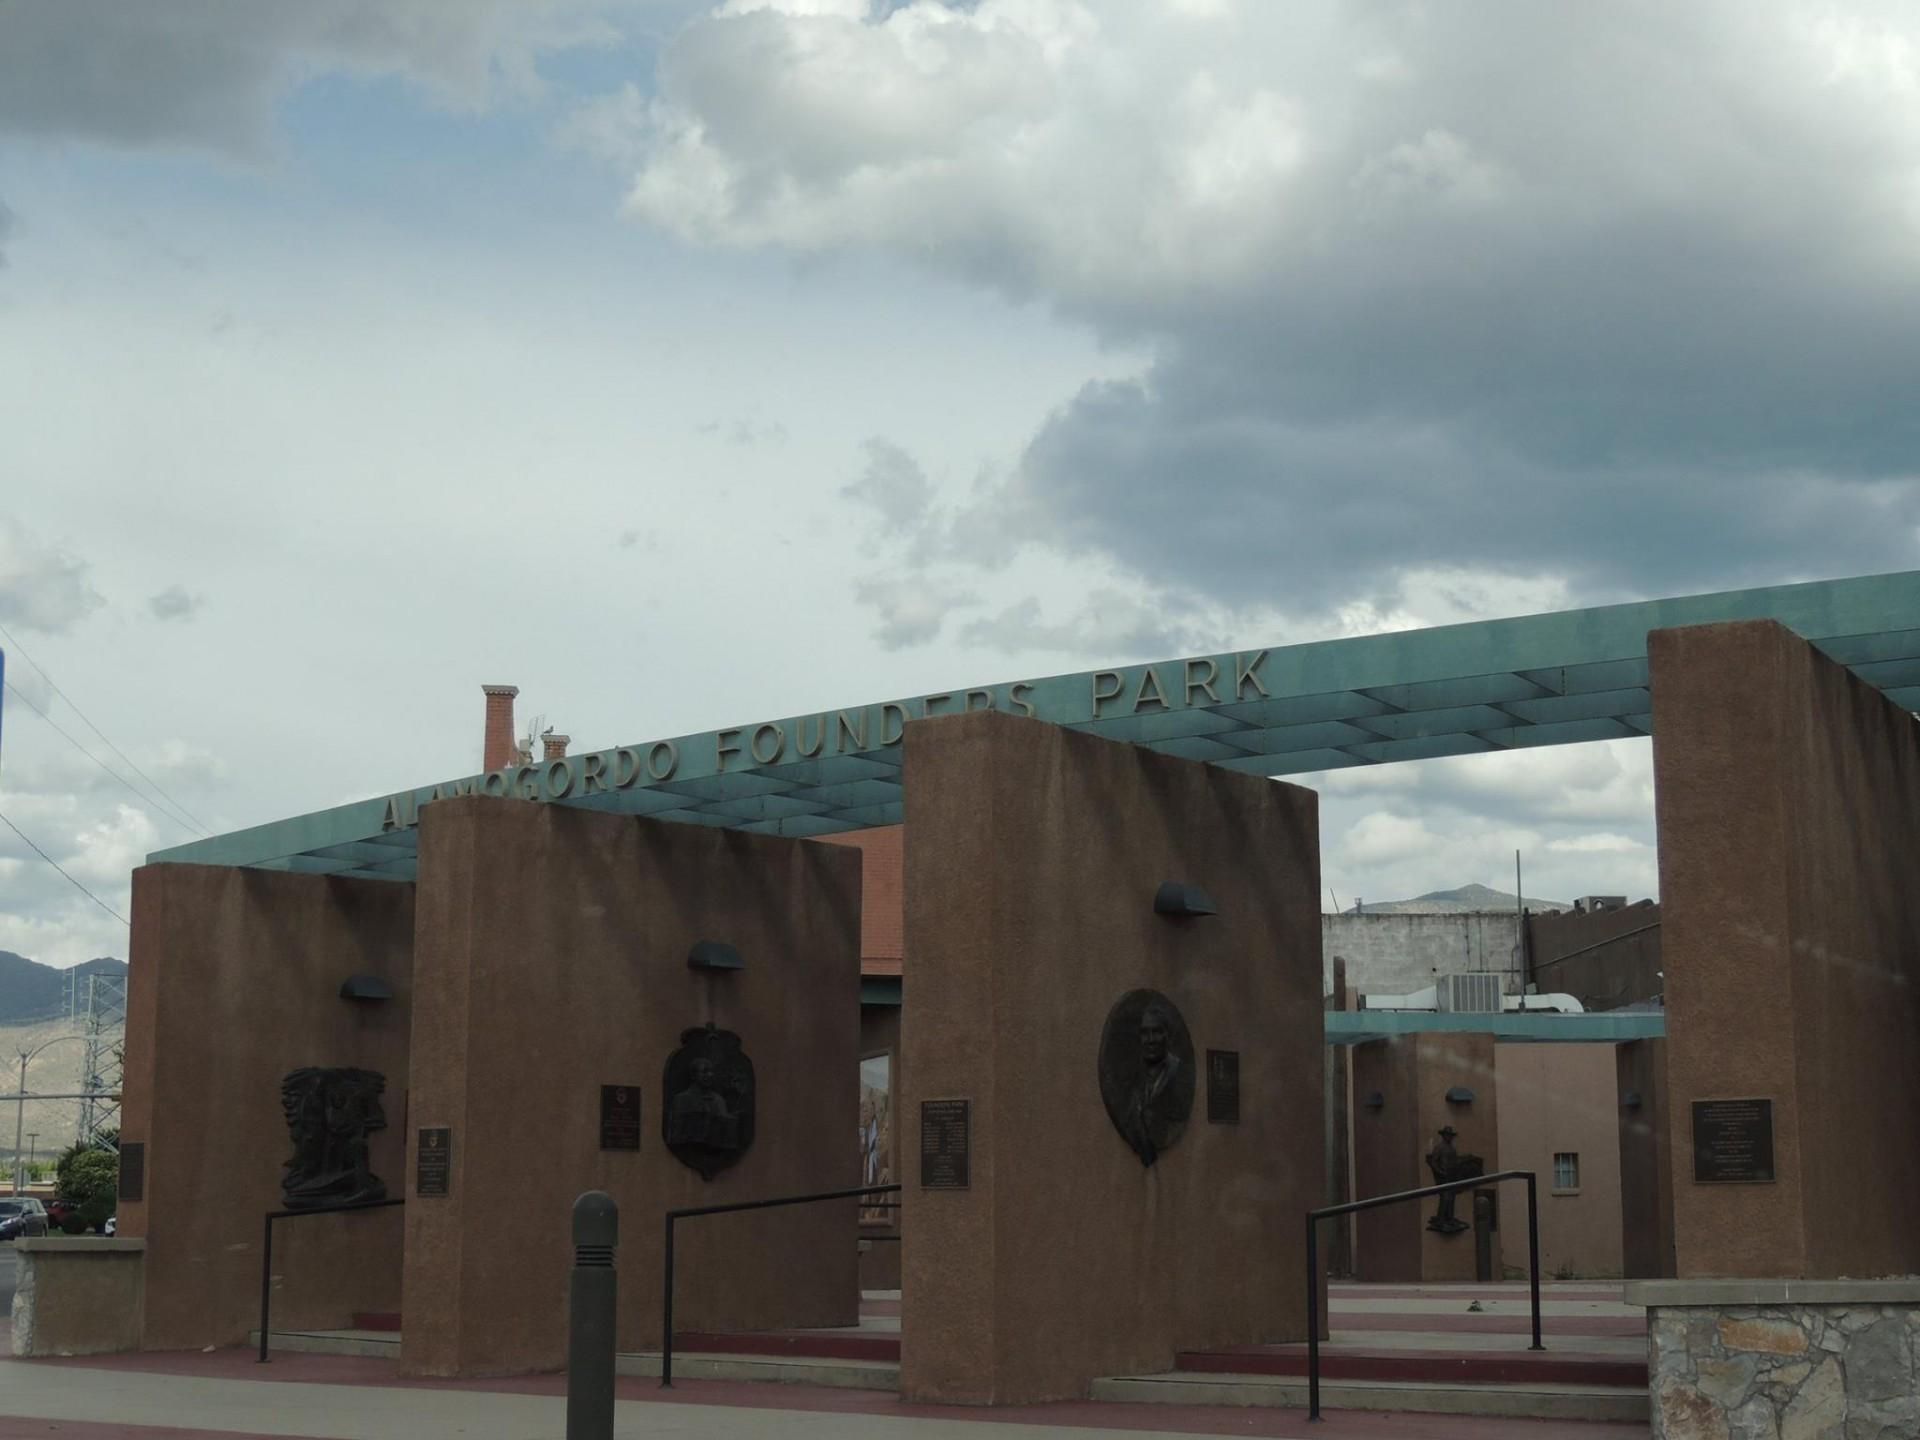 Alamogordo Founders Park